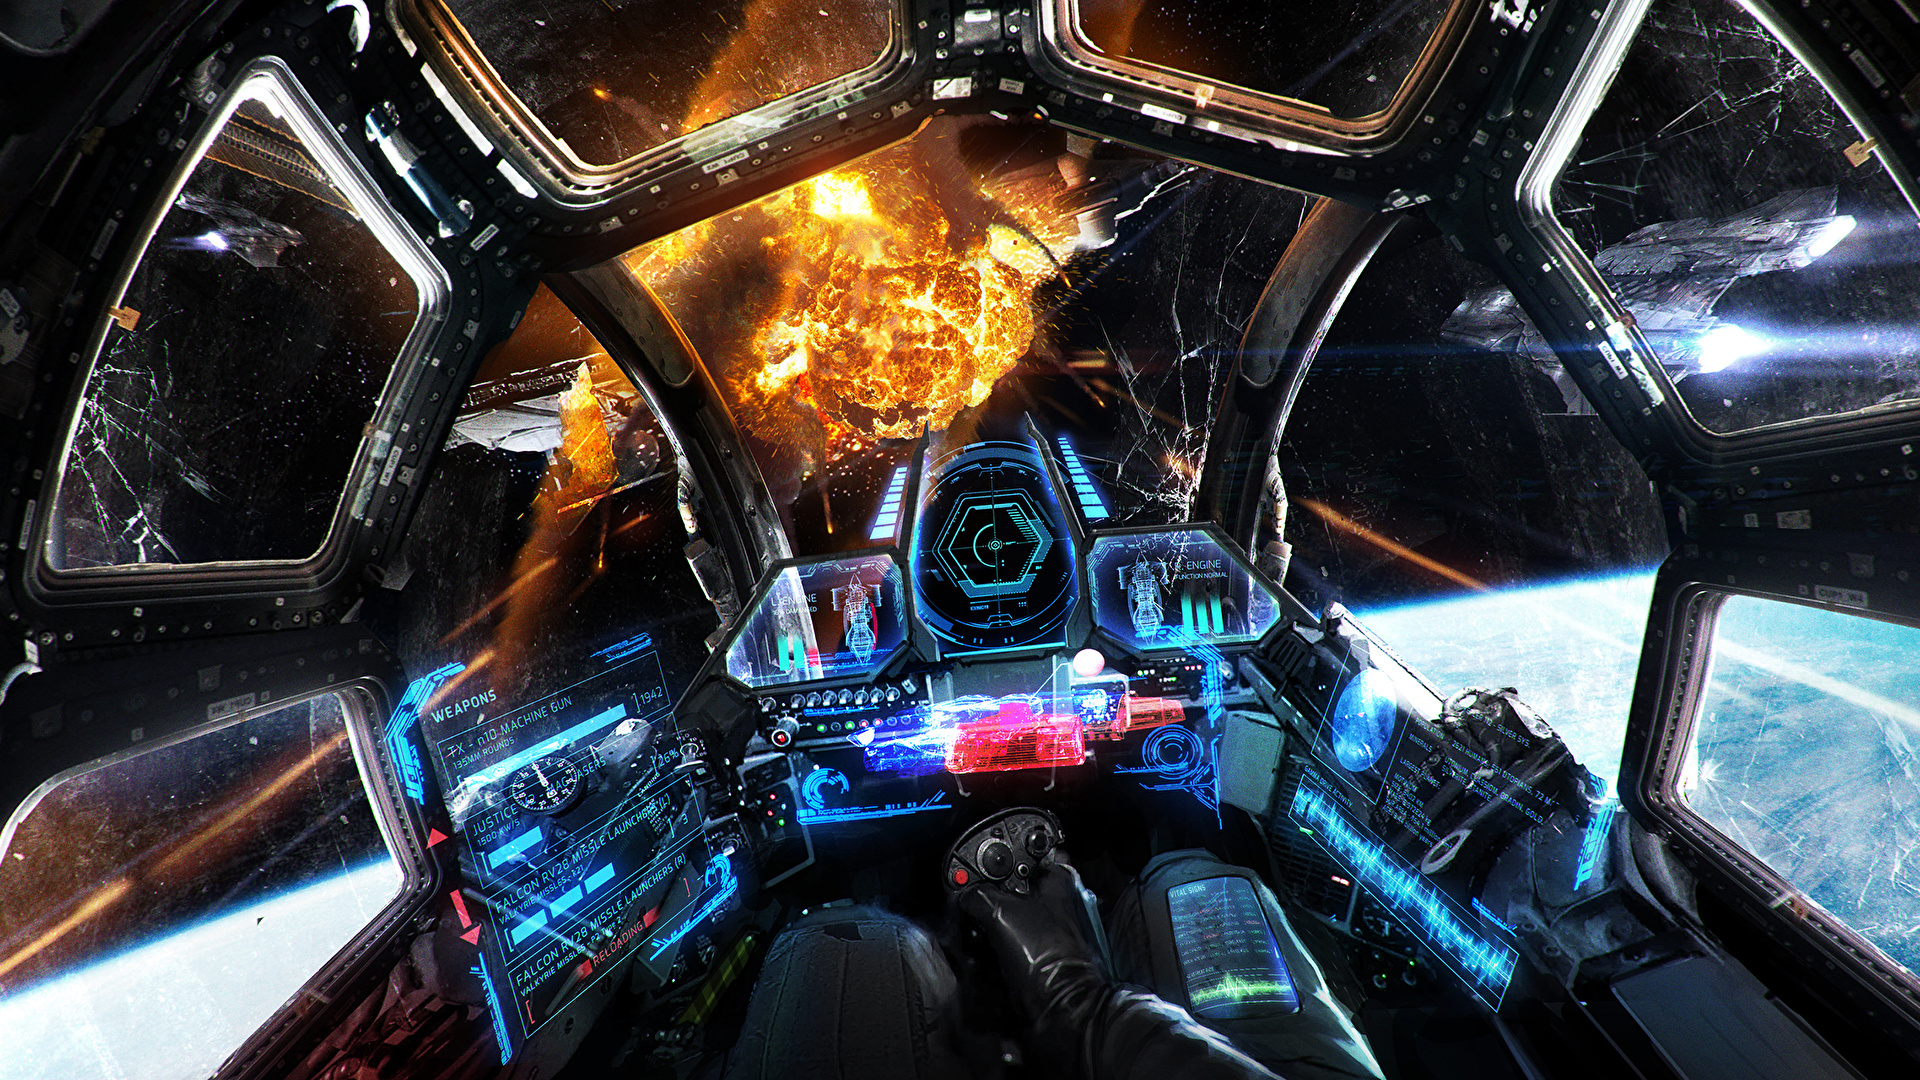 Photo Explosions Cockpit Space Fantasy Technics Fantasy 1920x1080